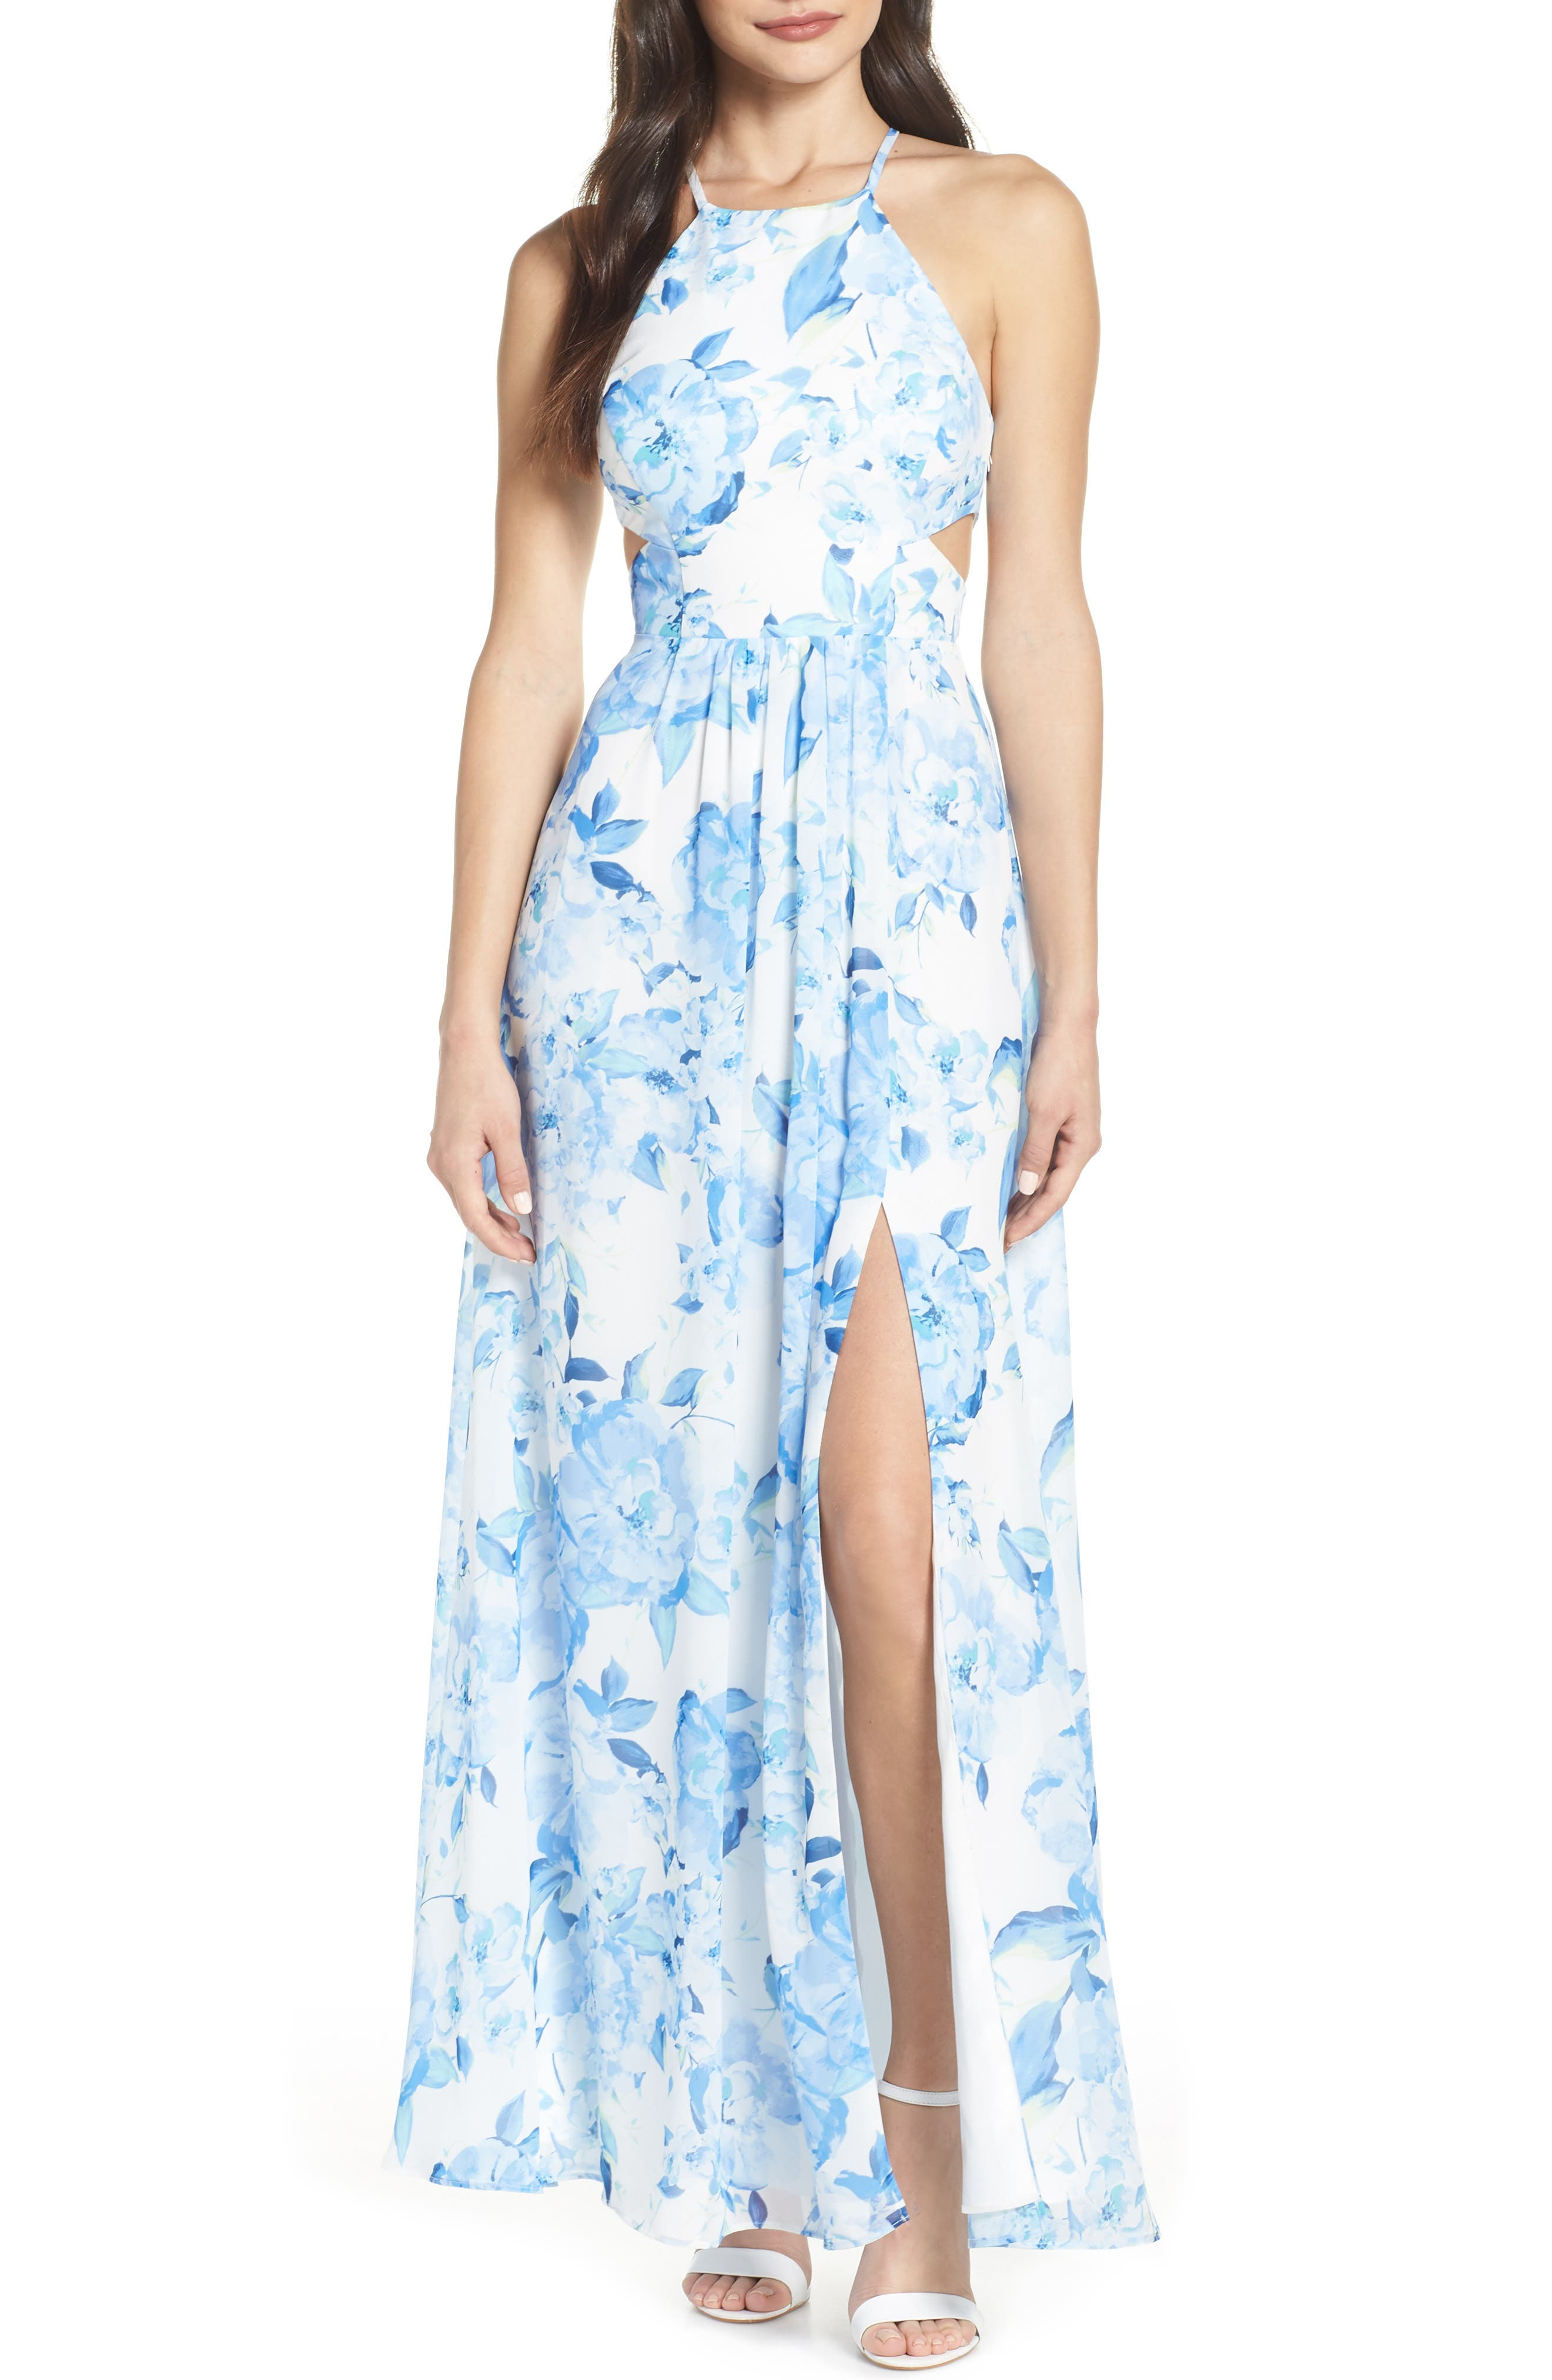 MORGAN & CO. Floral Print Strappy Back Evening Dress, Main, color, WHITE/ MULTI